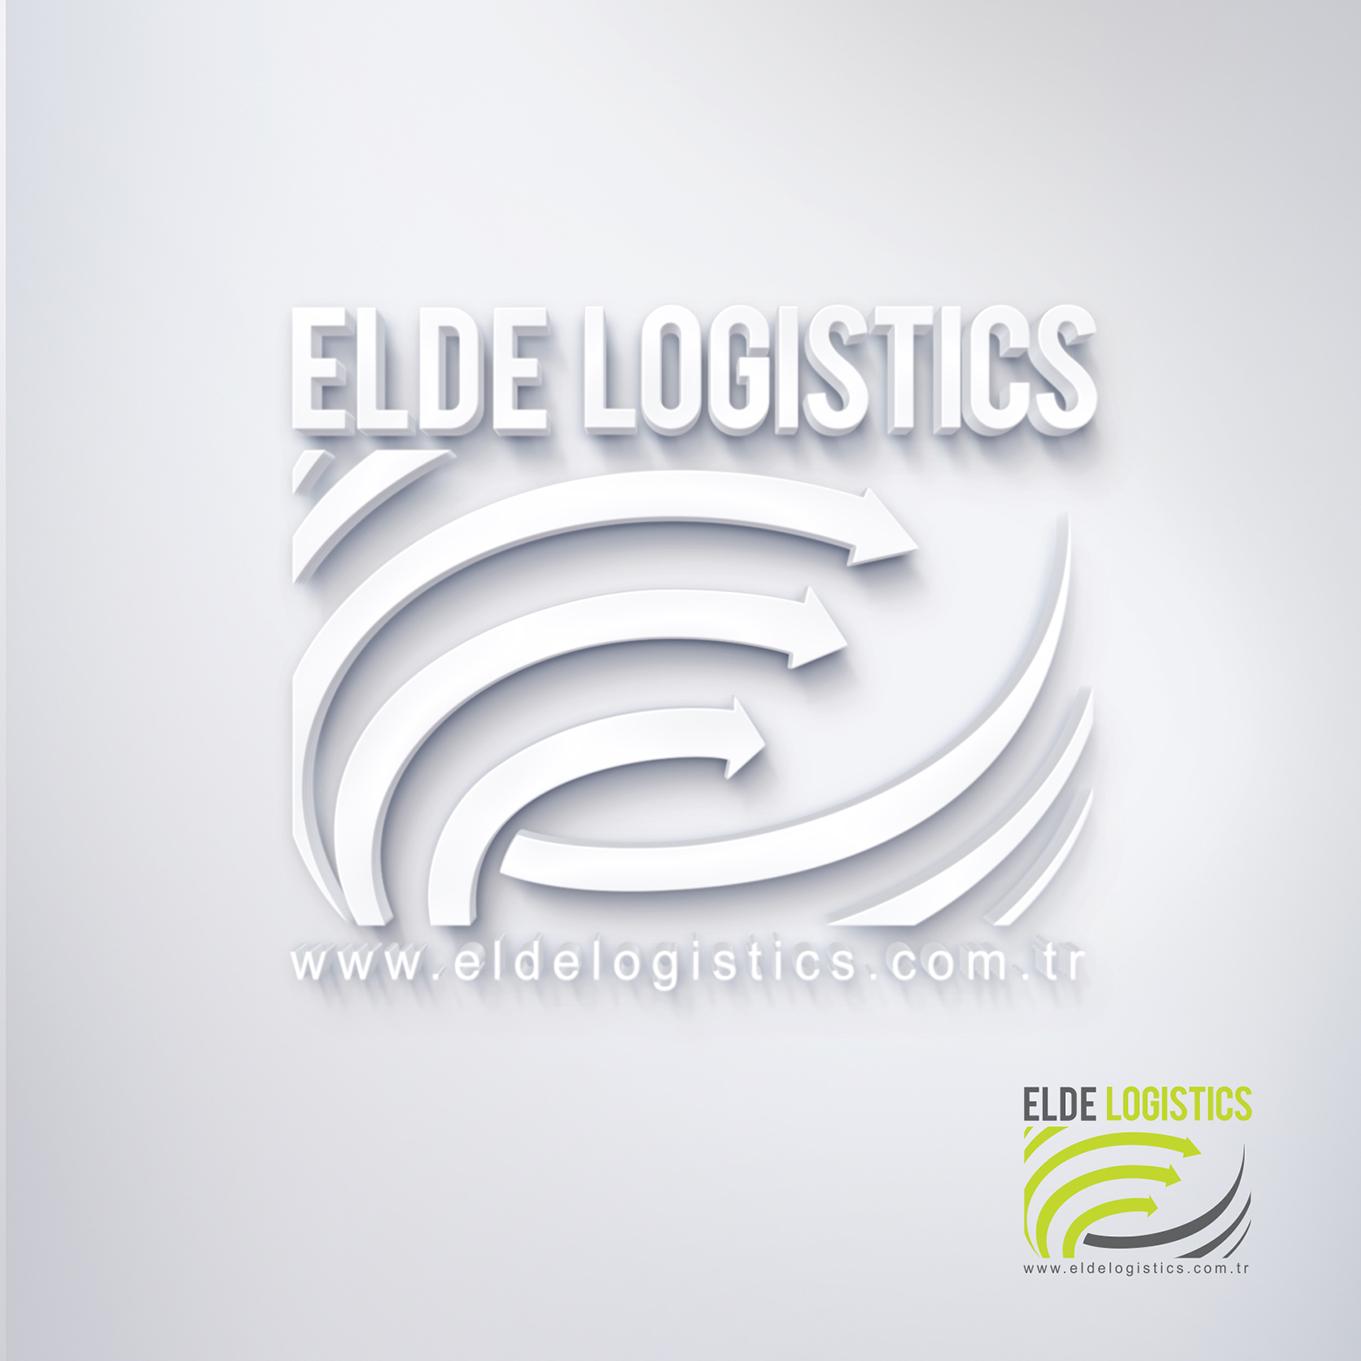 elde-logistics-logo-tasarimi